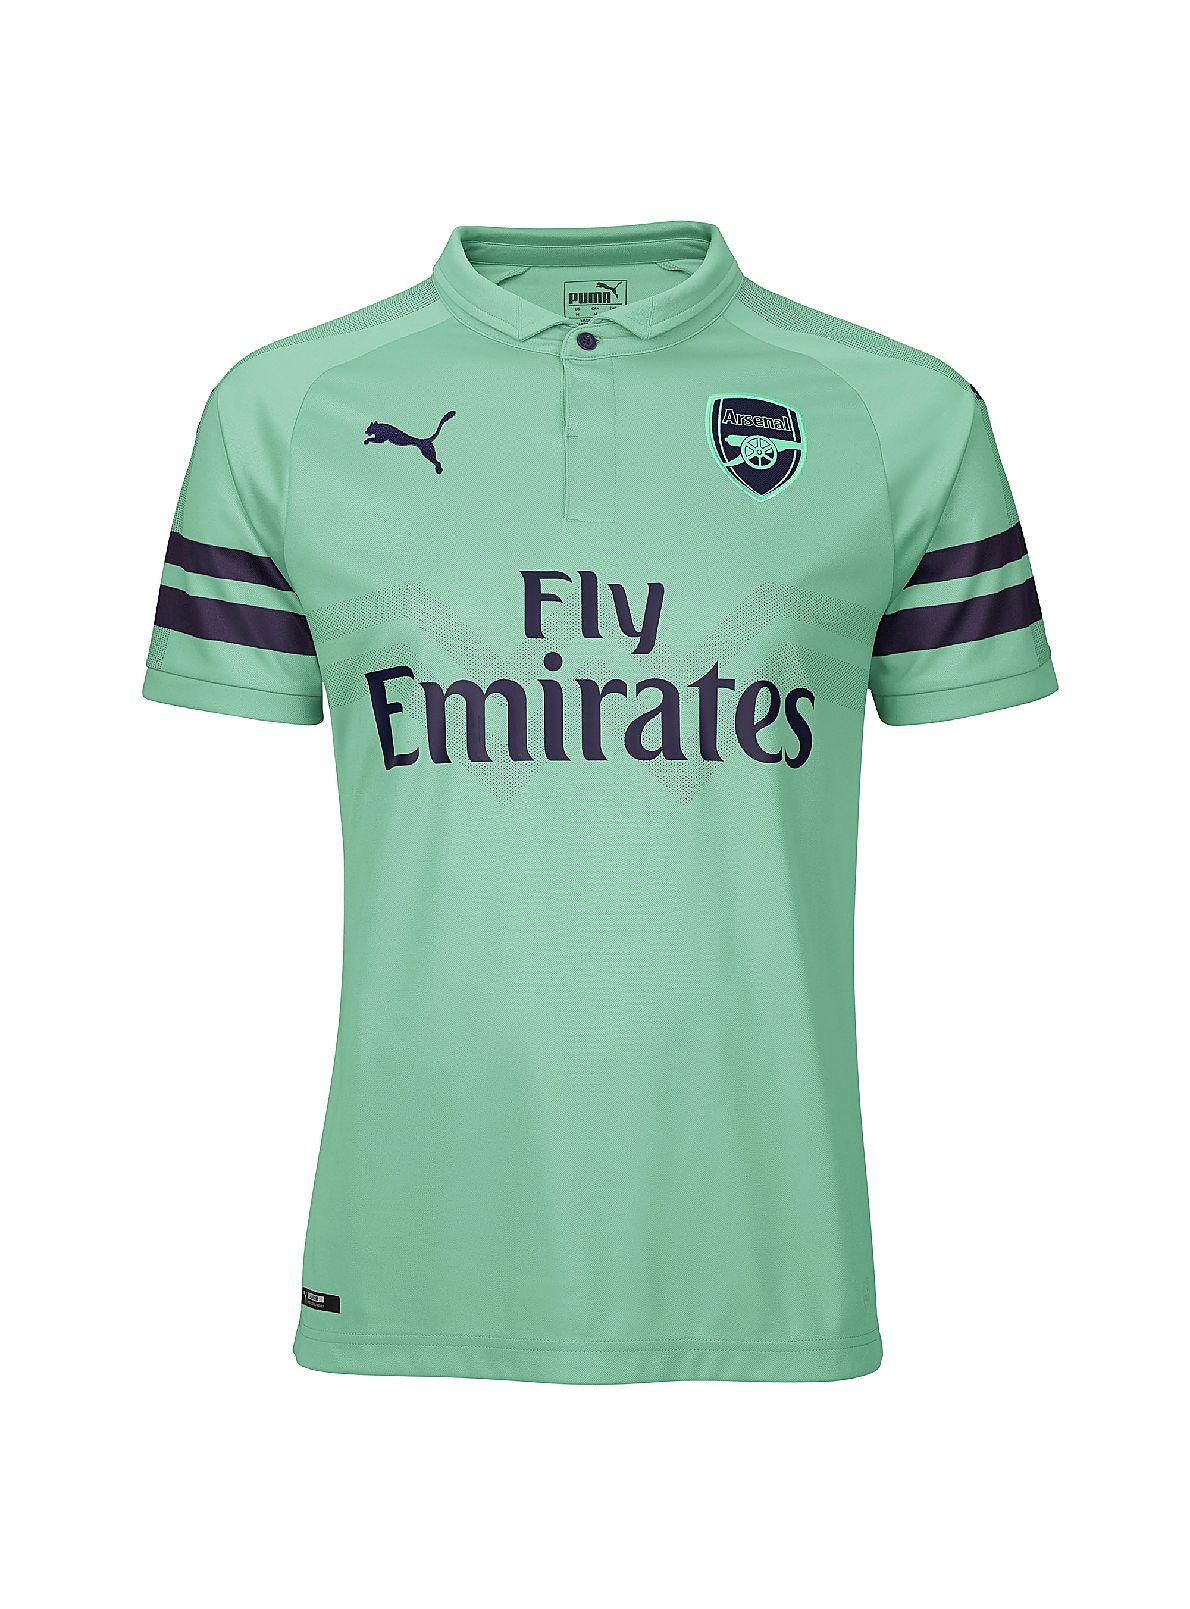 half off 75cd7 4430b Arsenal Has Revealed Their 2018/19 Third Kit by Puma